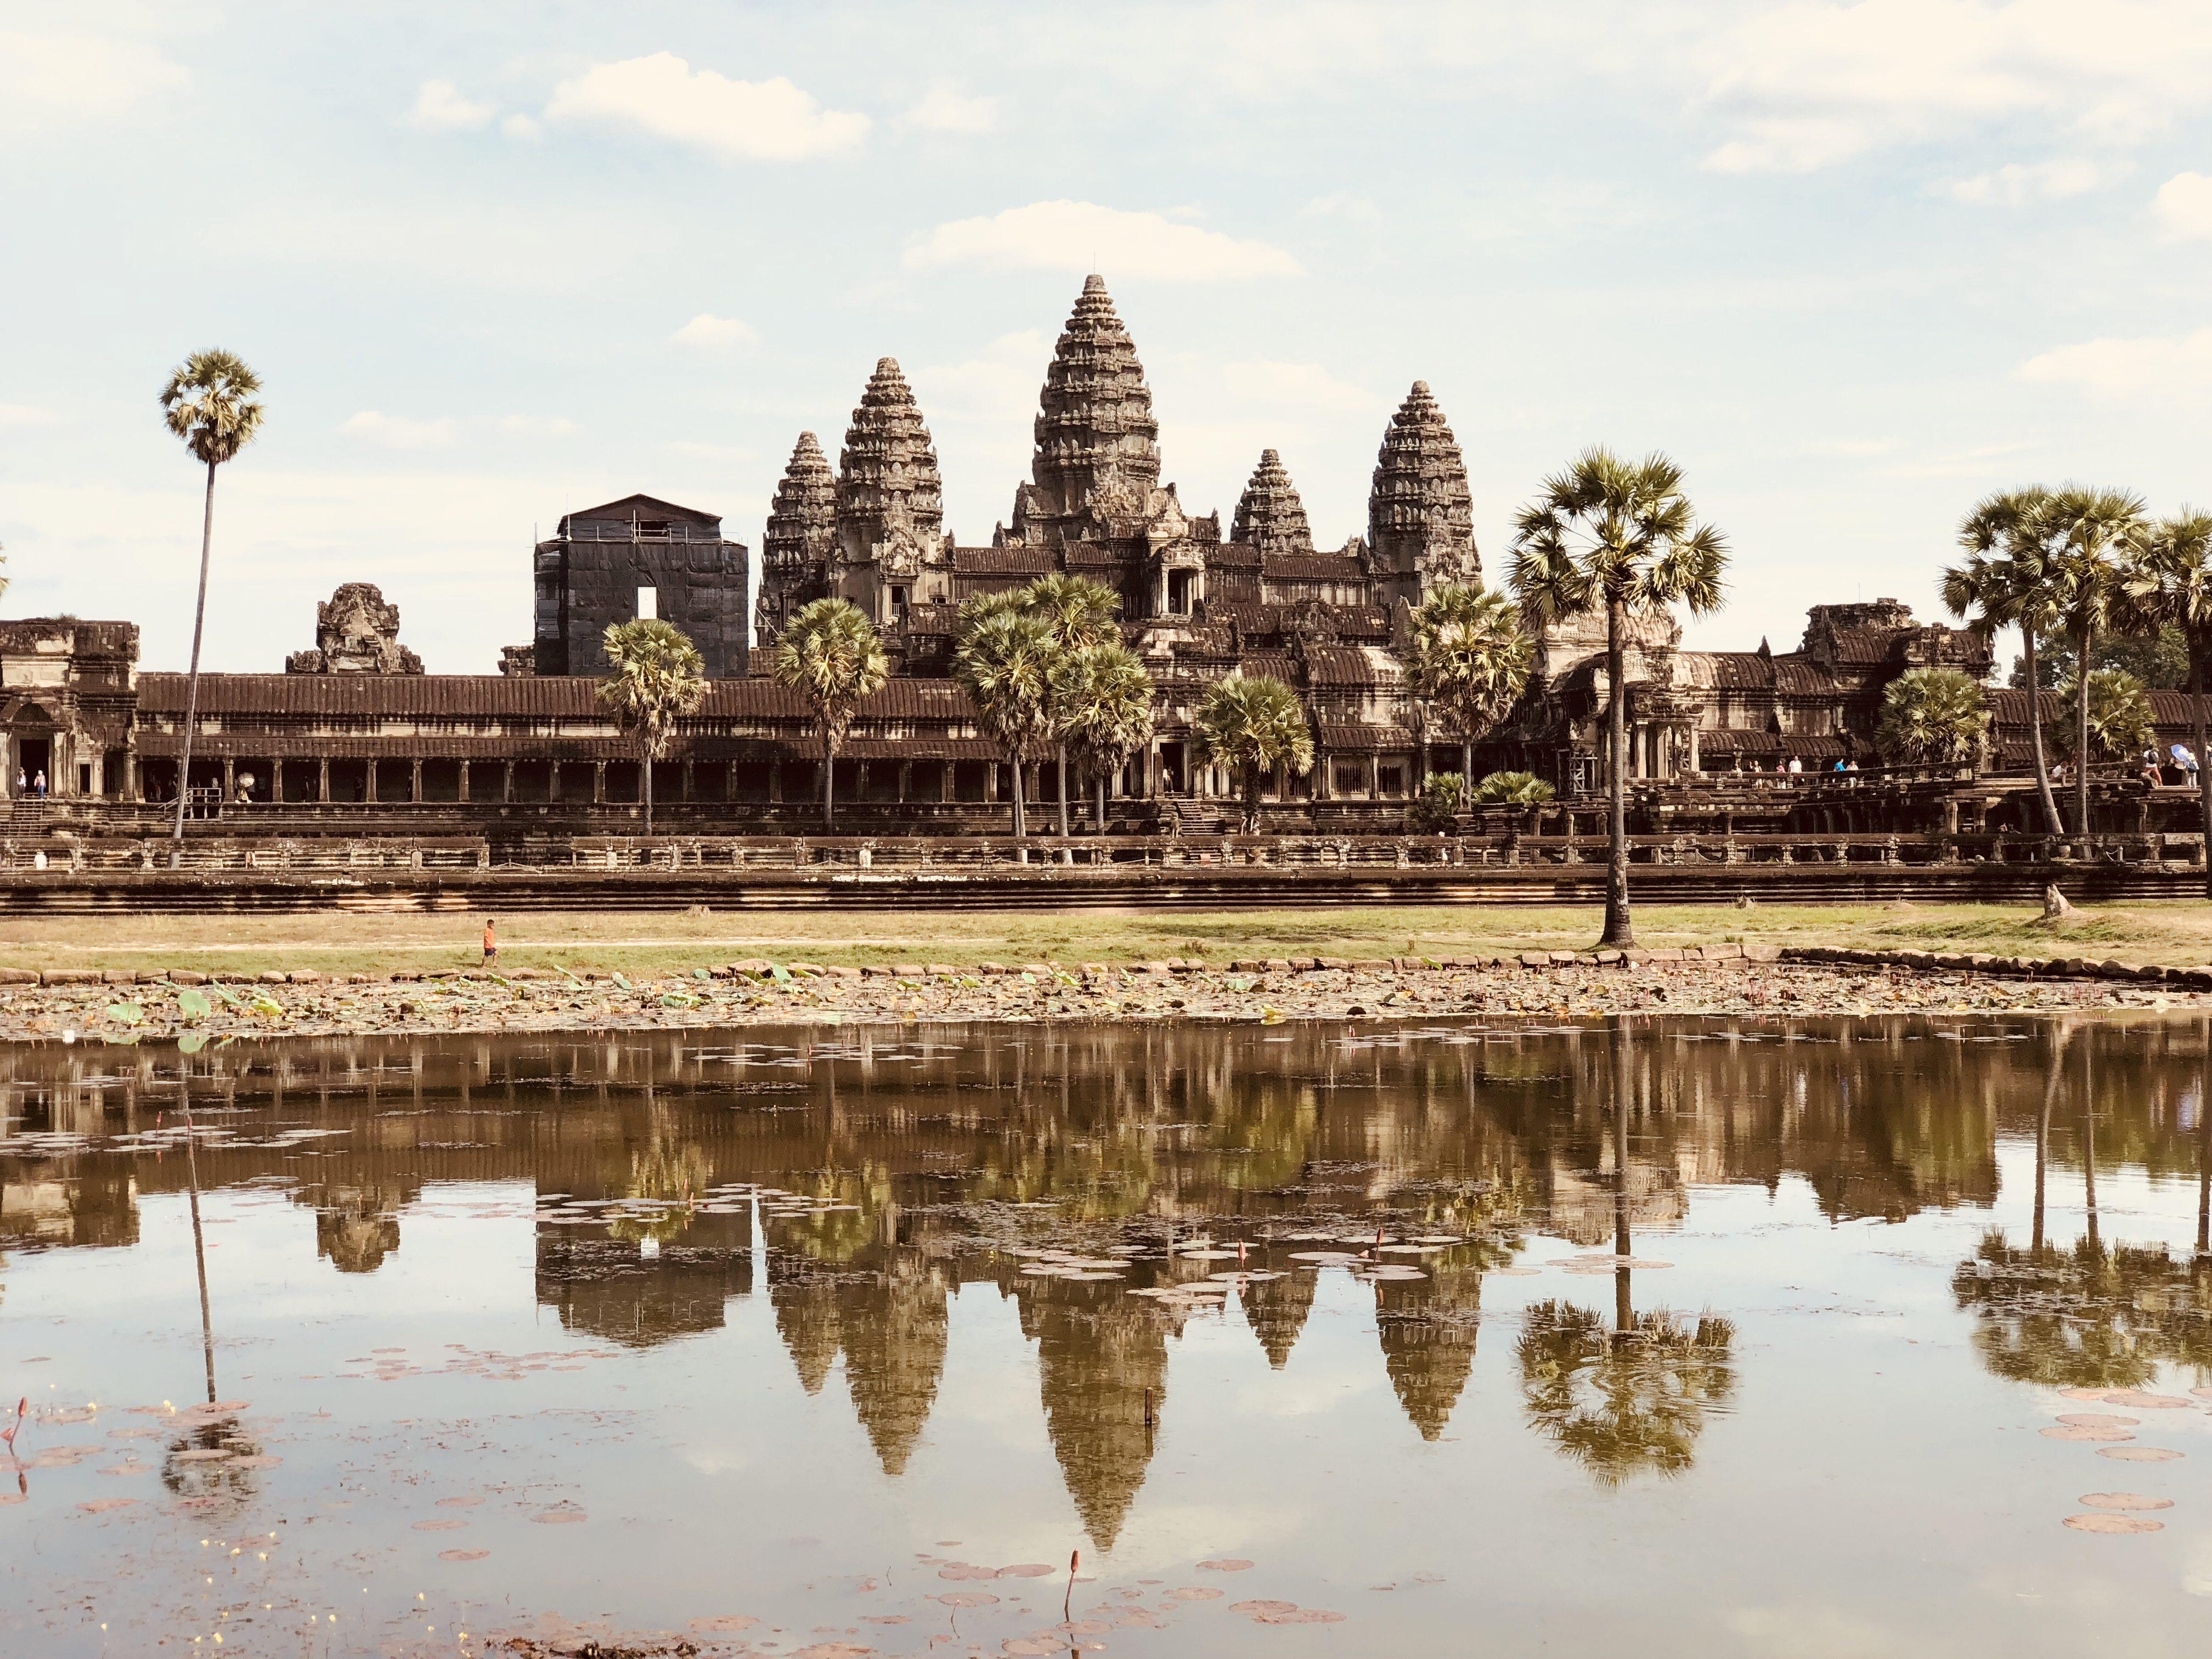 Angkor Wat Temples | Siem Reap